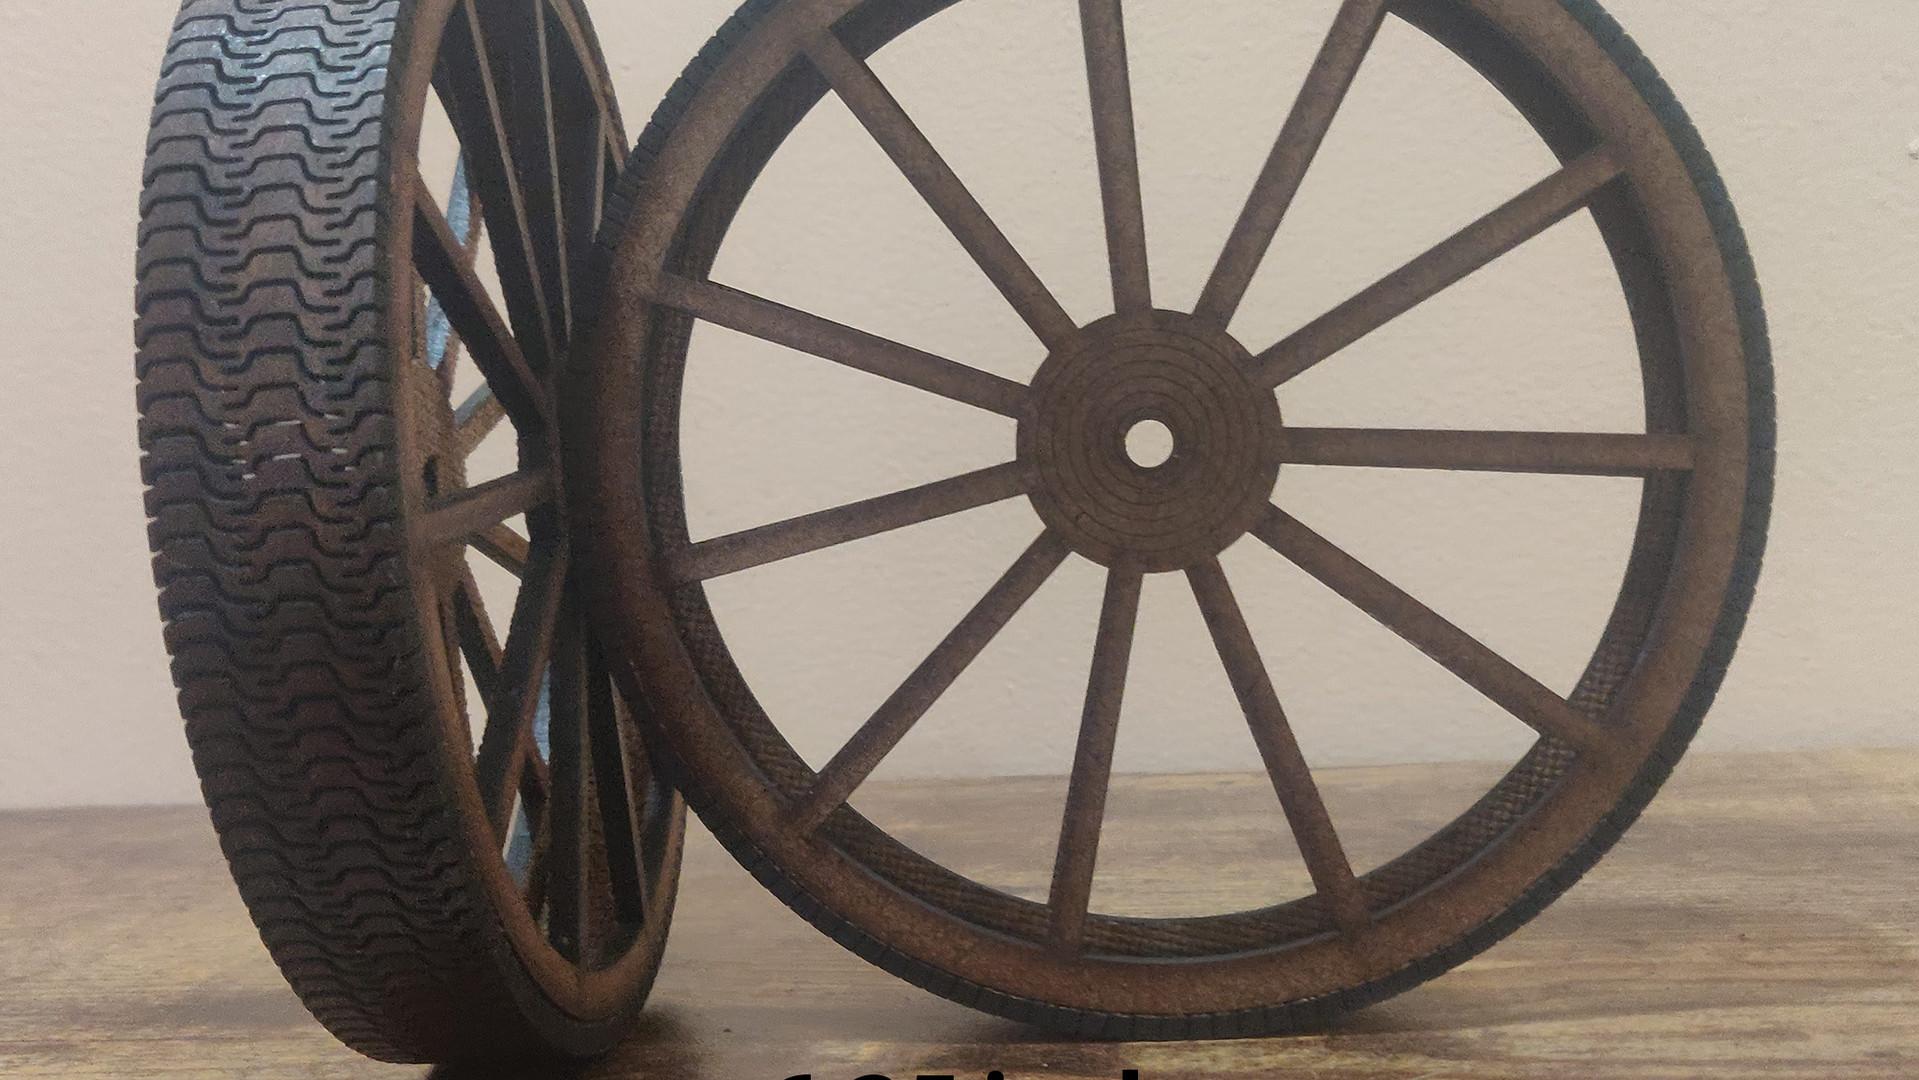 6.25 inch wheels with tread